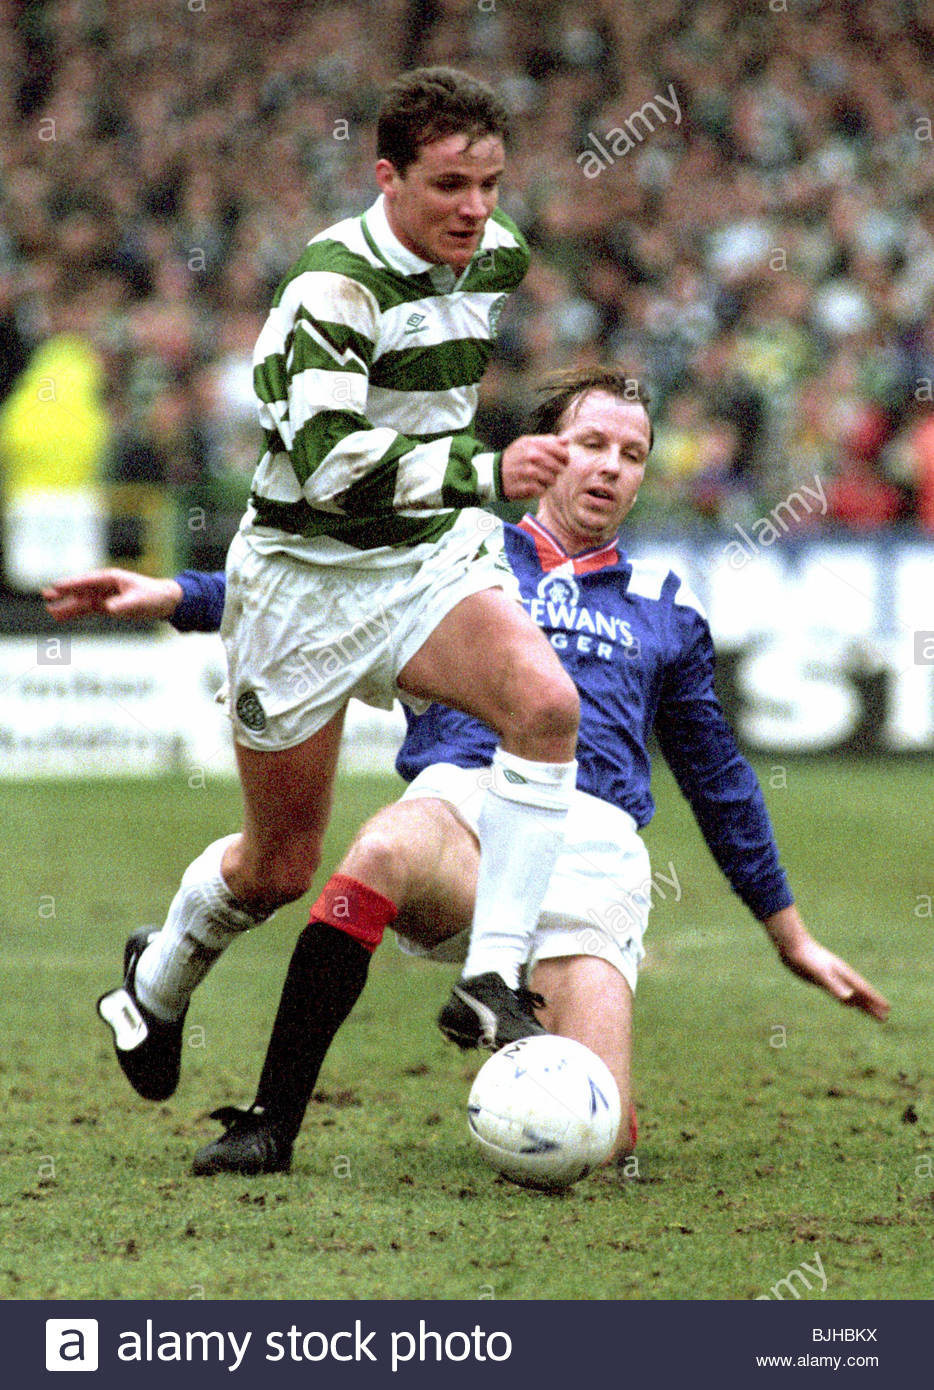 20/03/93 PREMIER DIVISION CELTIC V RANGERS (2-1) CELTIC PARK - GLASGOW Celtic's Stuart Slater (left) manages - Stock Image